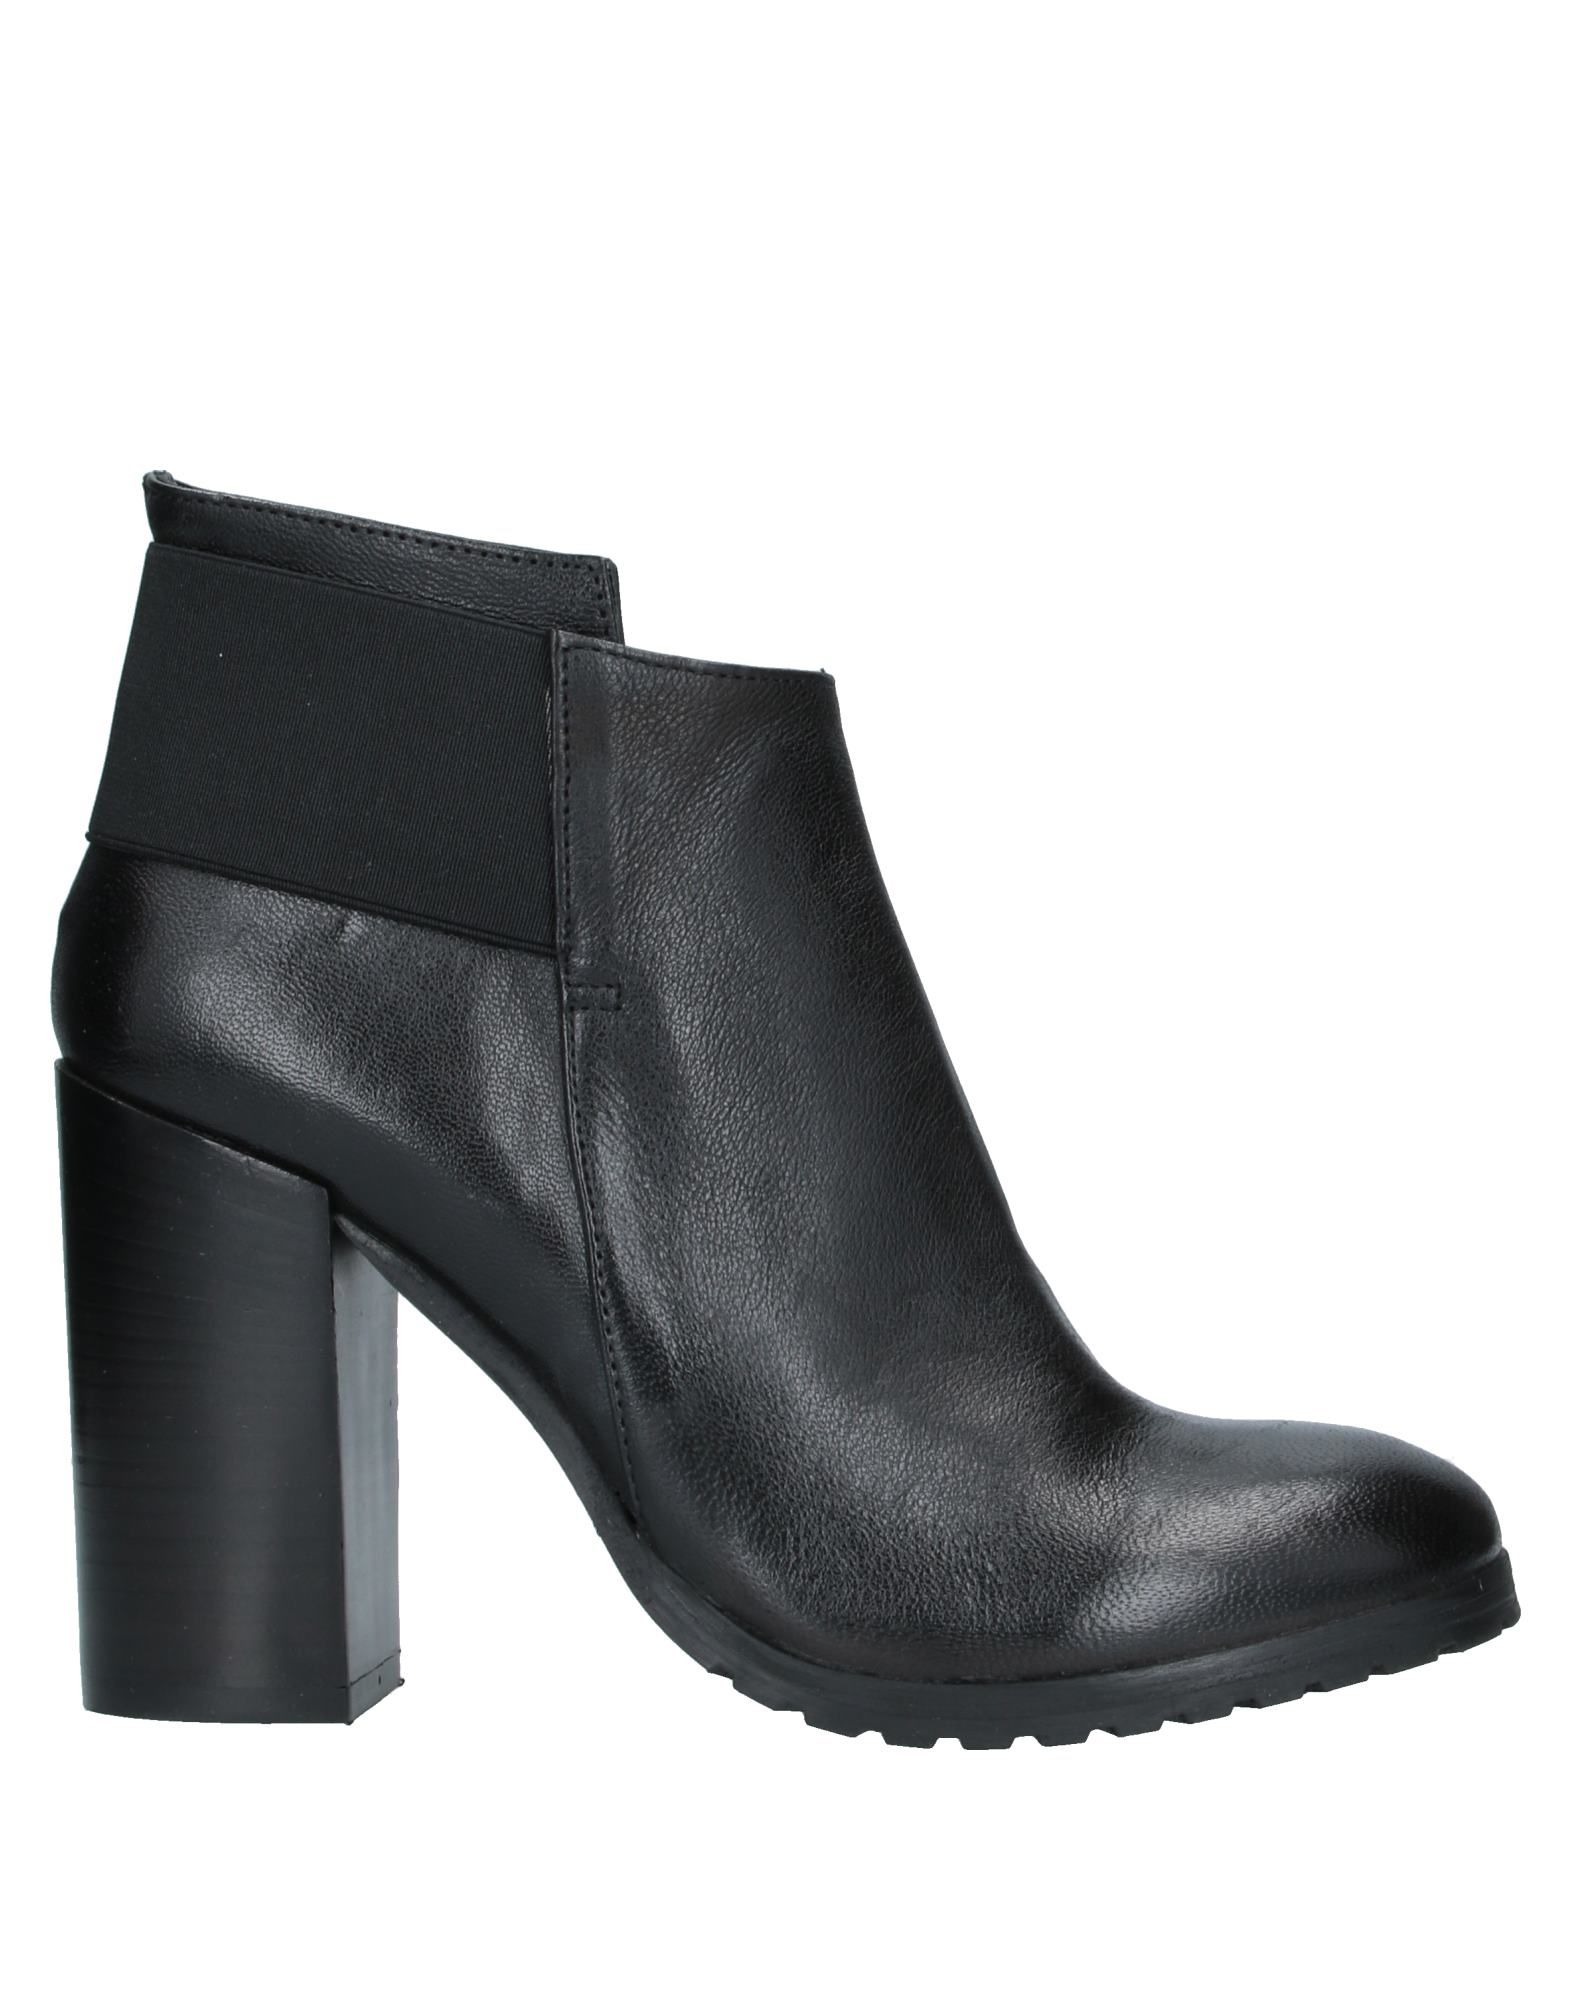 FEDERICA MILANO Полусапоги и высокие ботинки wo milano полусапоги и высокие ботинки